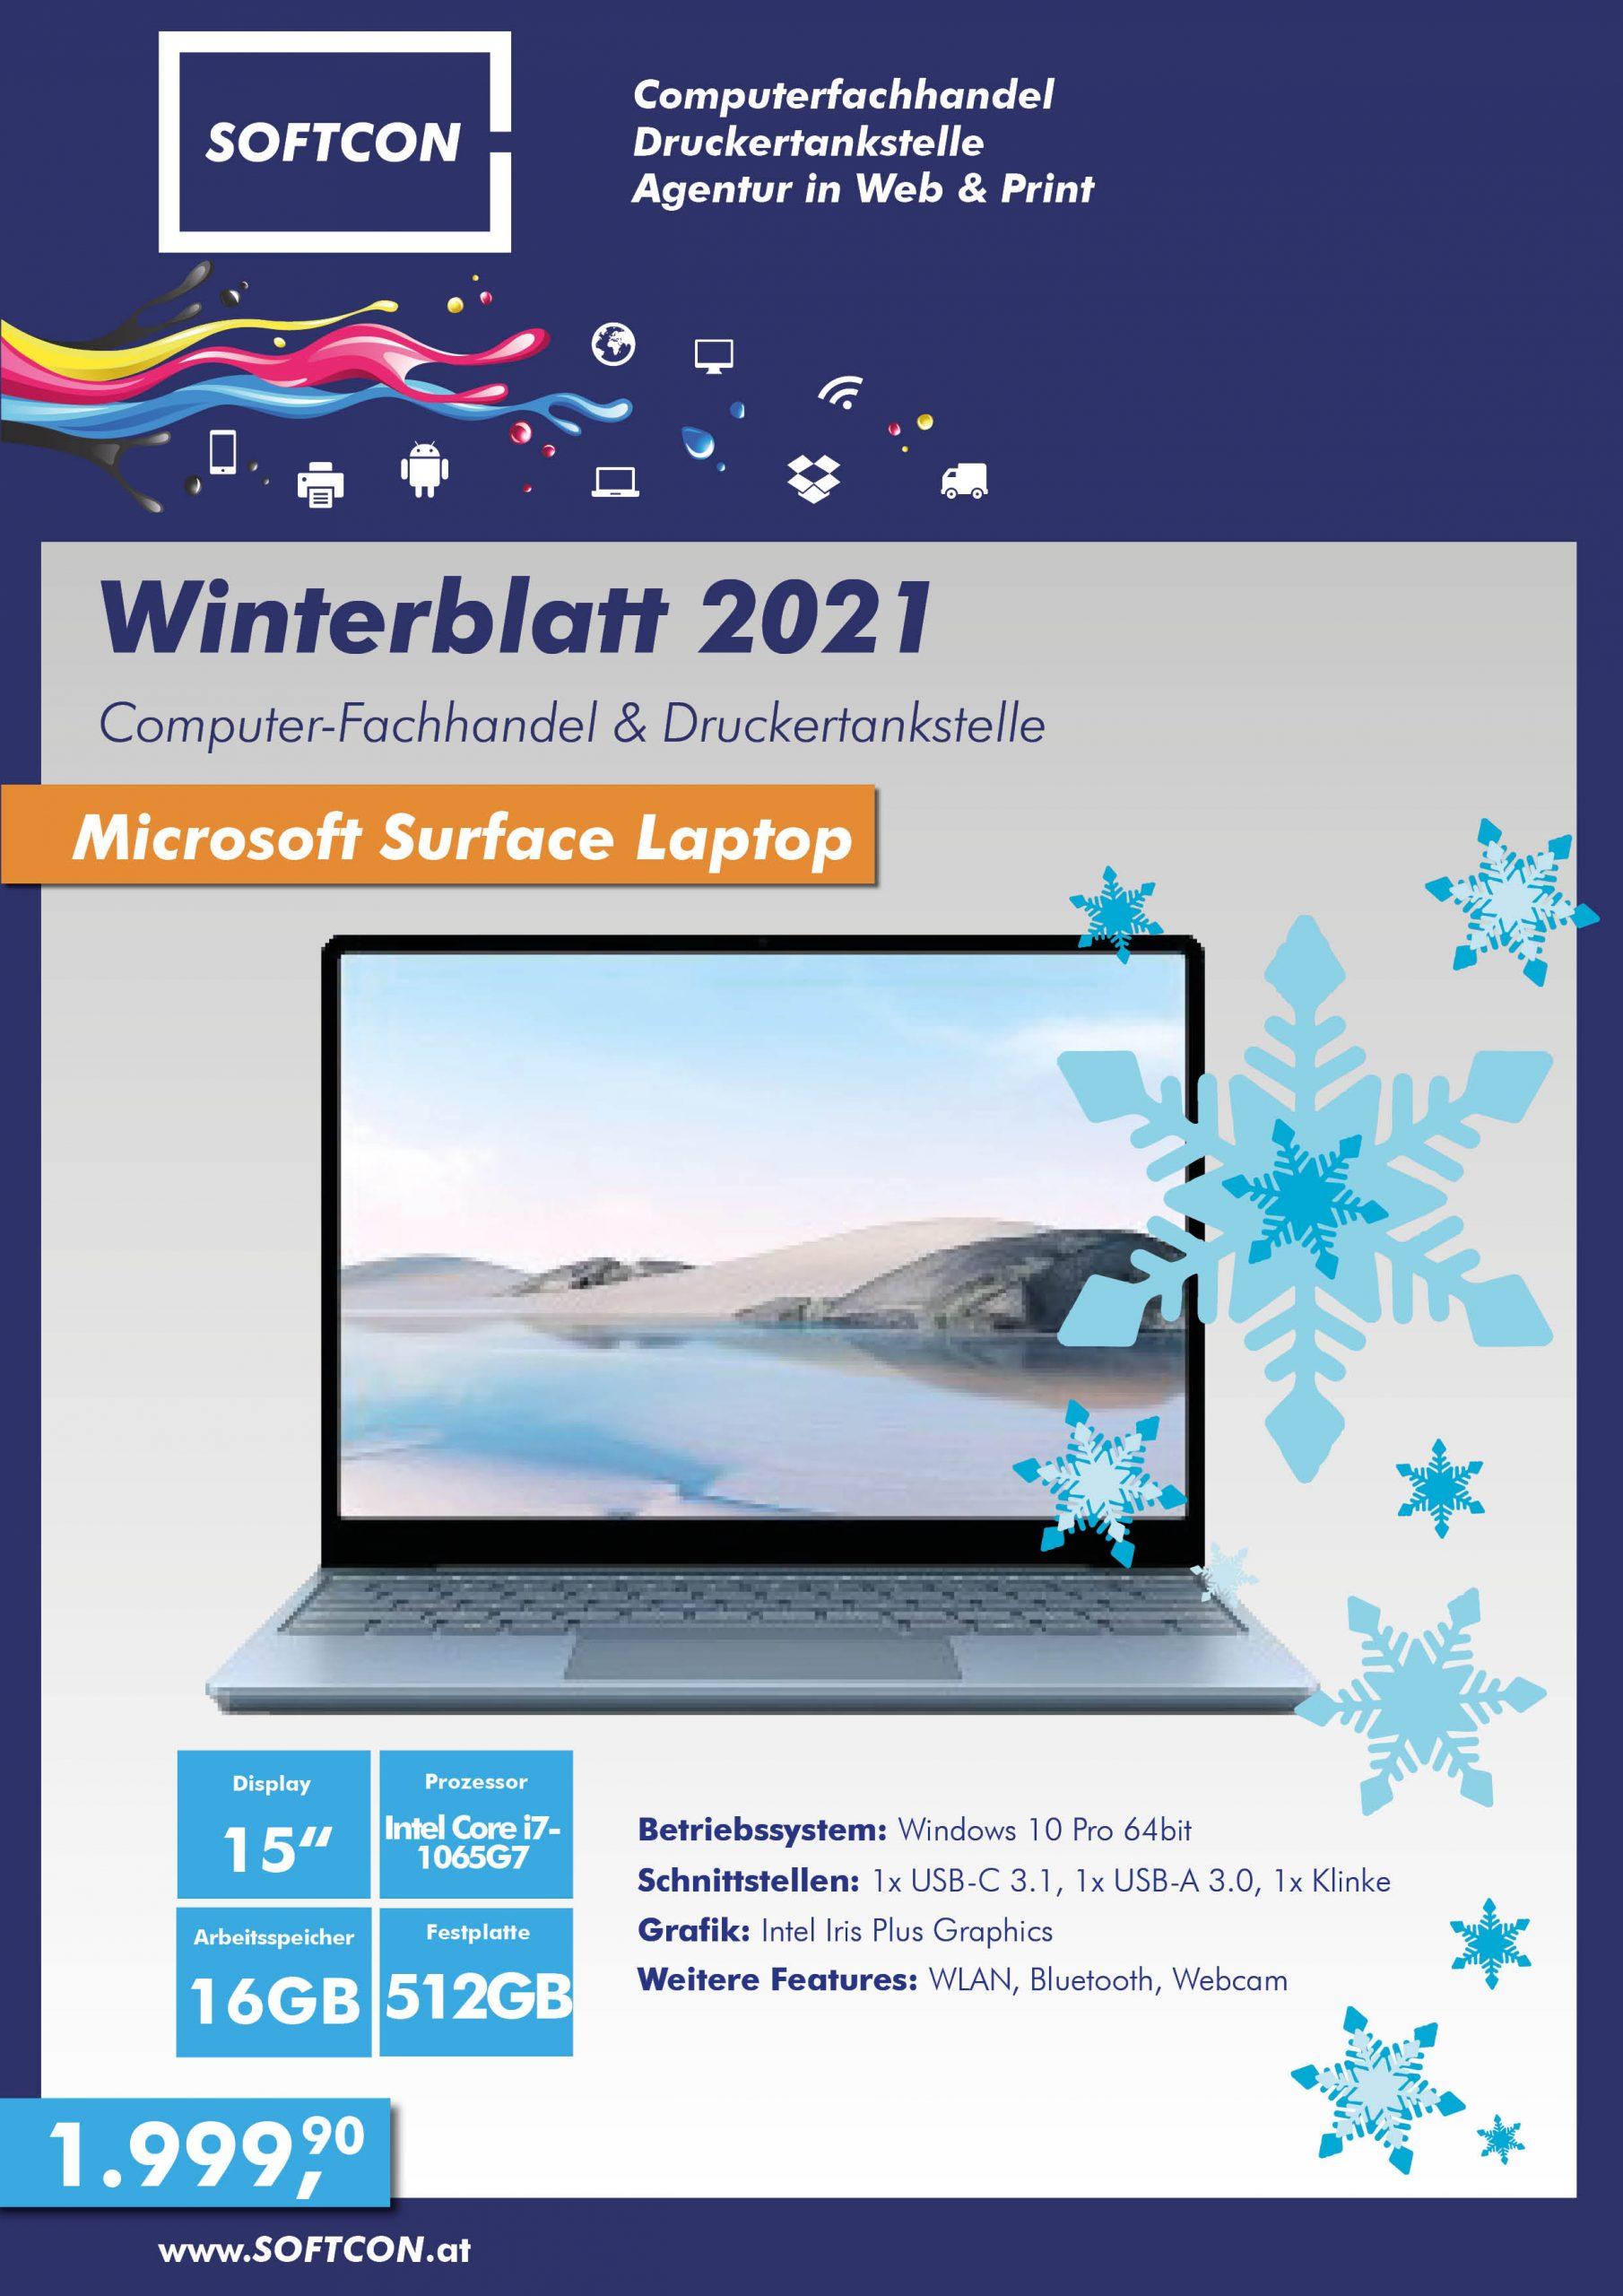 SOFTCON Winterblatt 2021